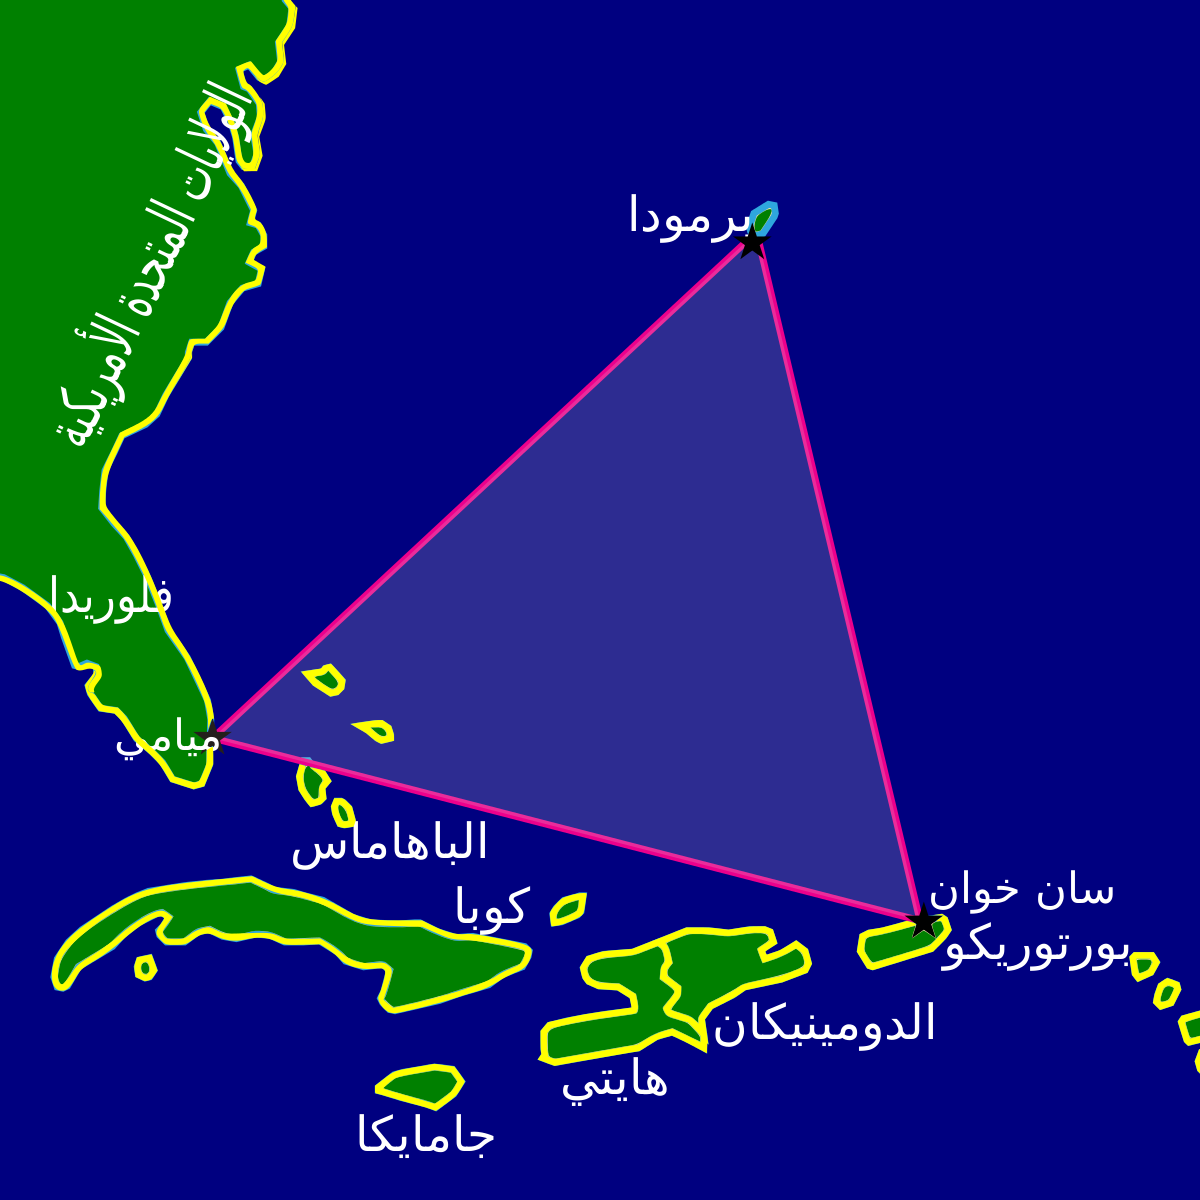 صوره حقيقة مثلث برمودا , شاهد بالفيديو عجائب وغرائب مثلث برمودا